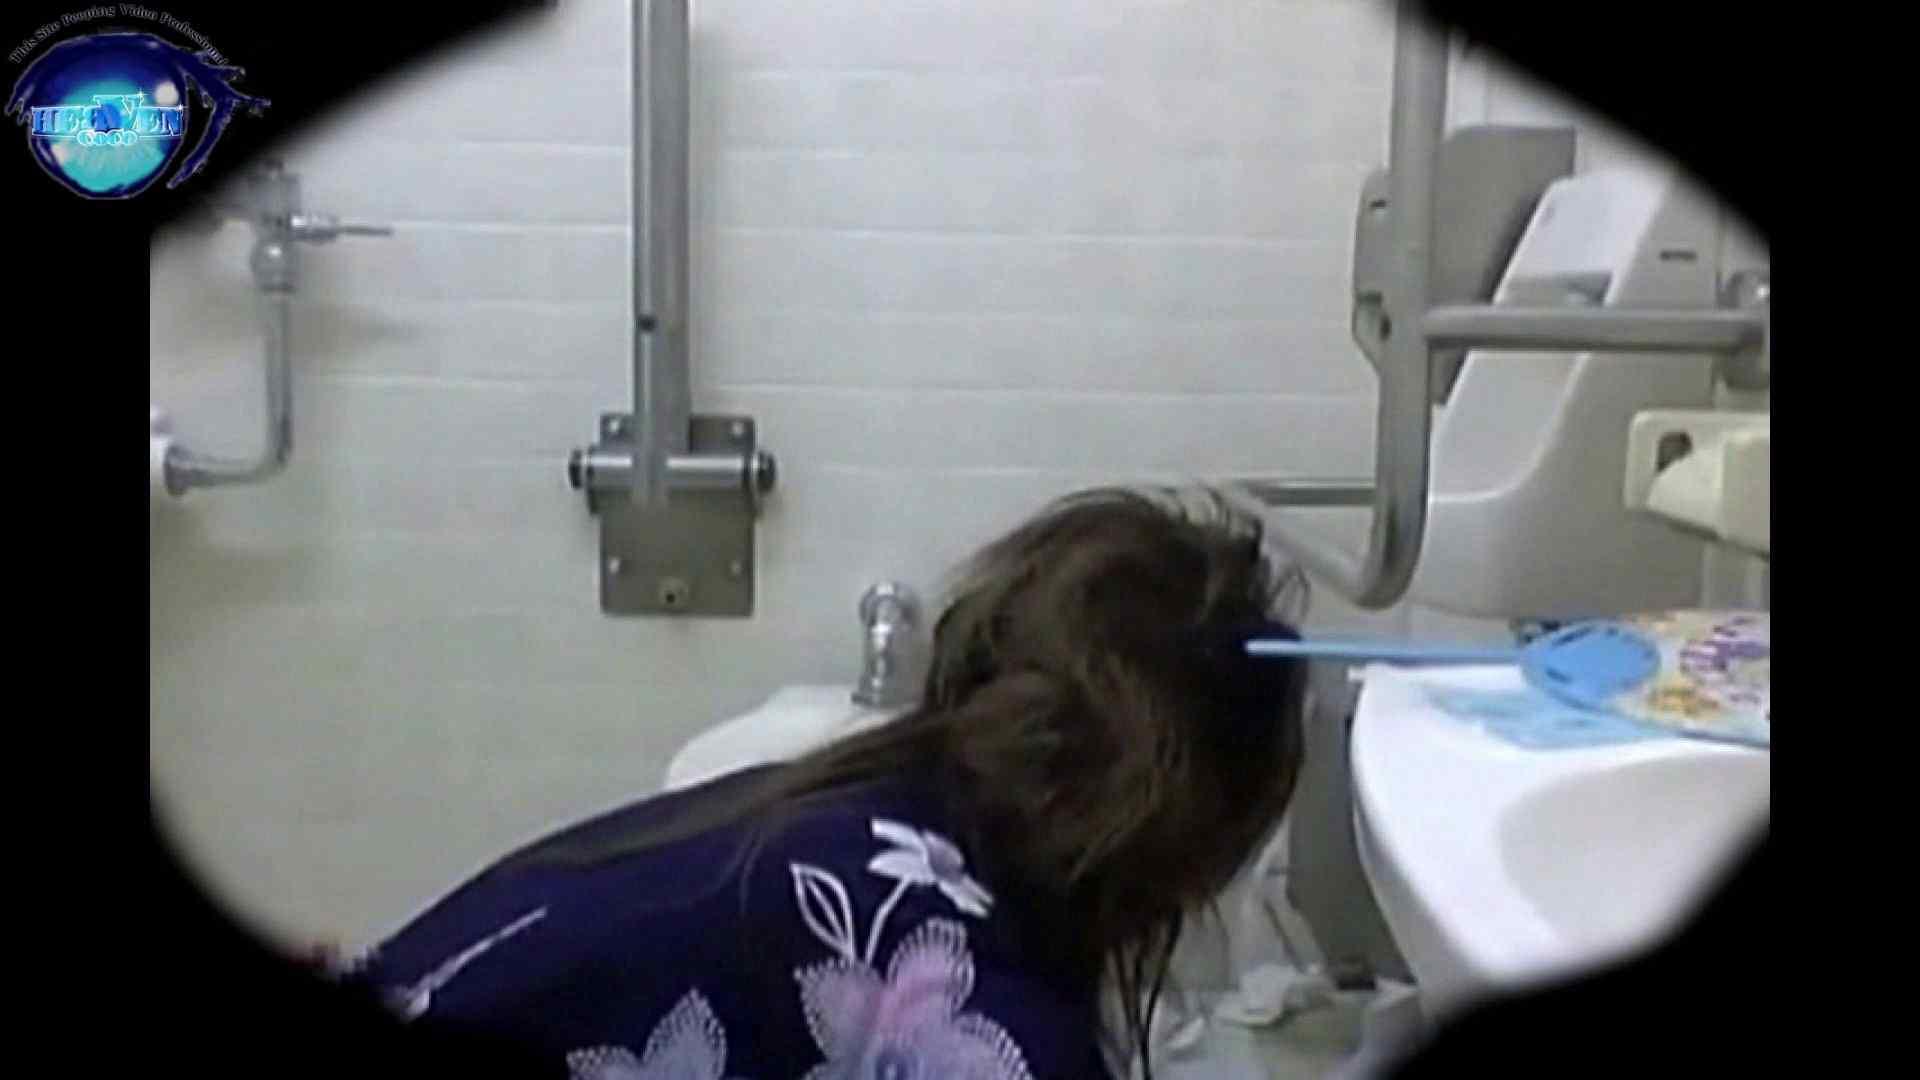 teen galトイレ覗き紙がナイ編‼vol.17 OLのエロ生活 えろ無修正画像 52連発 42